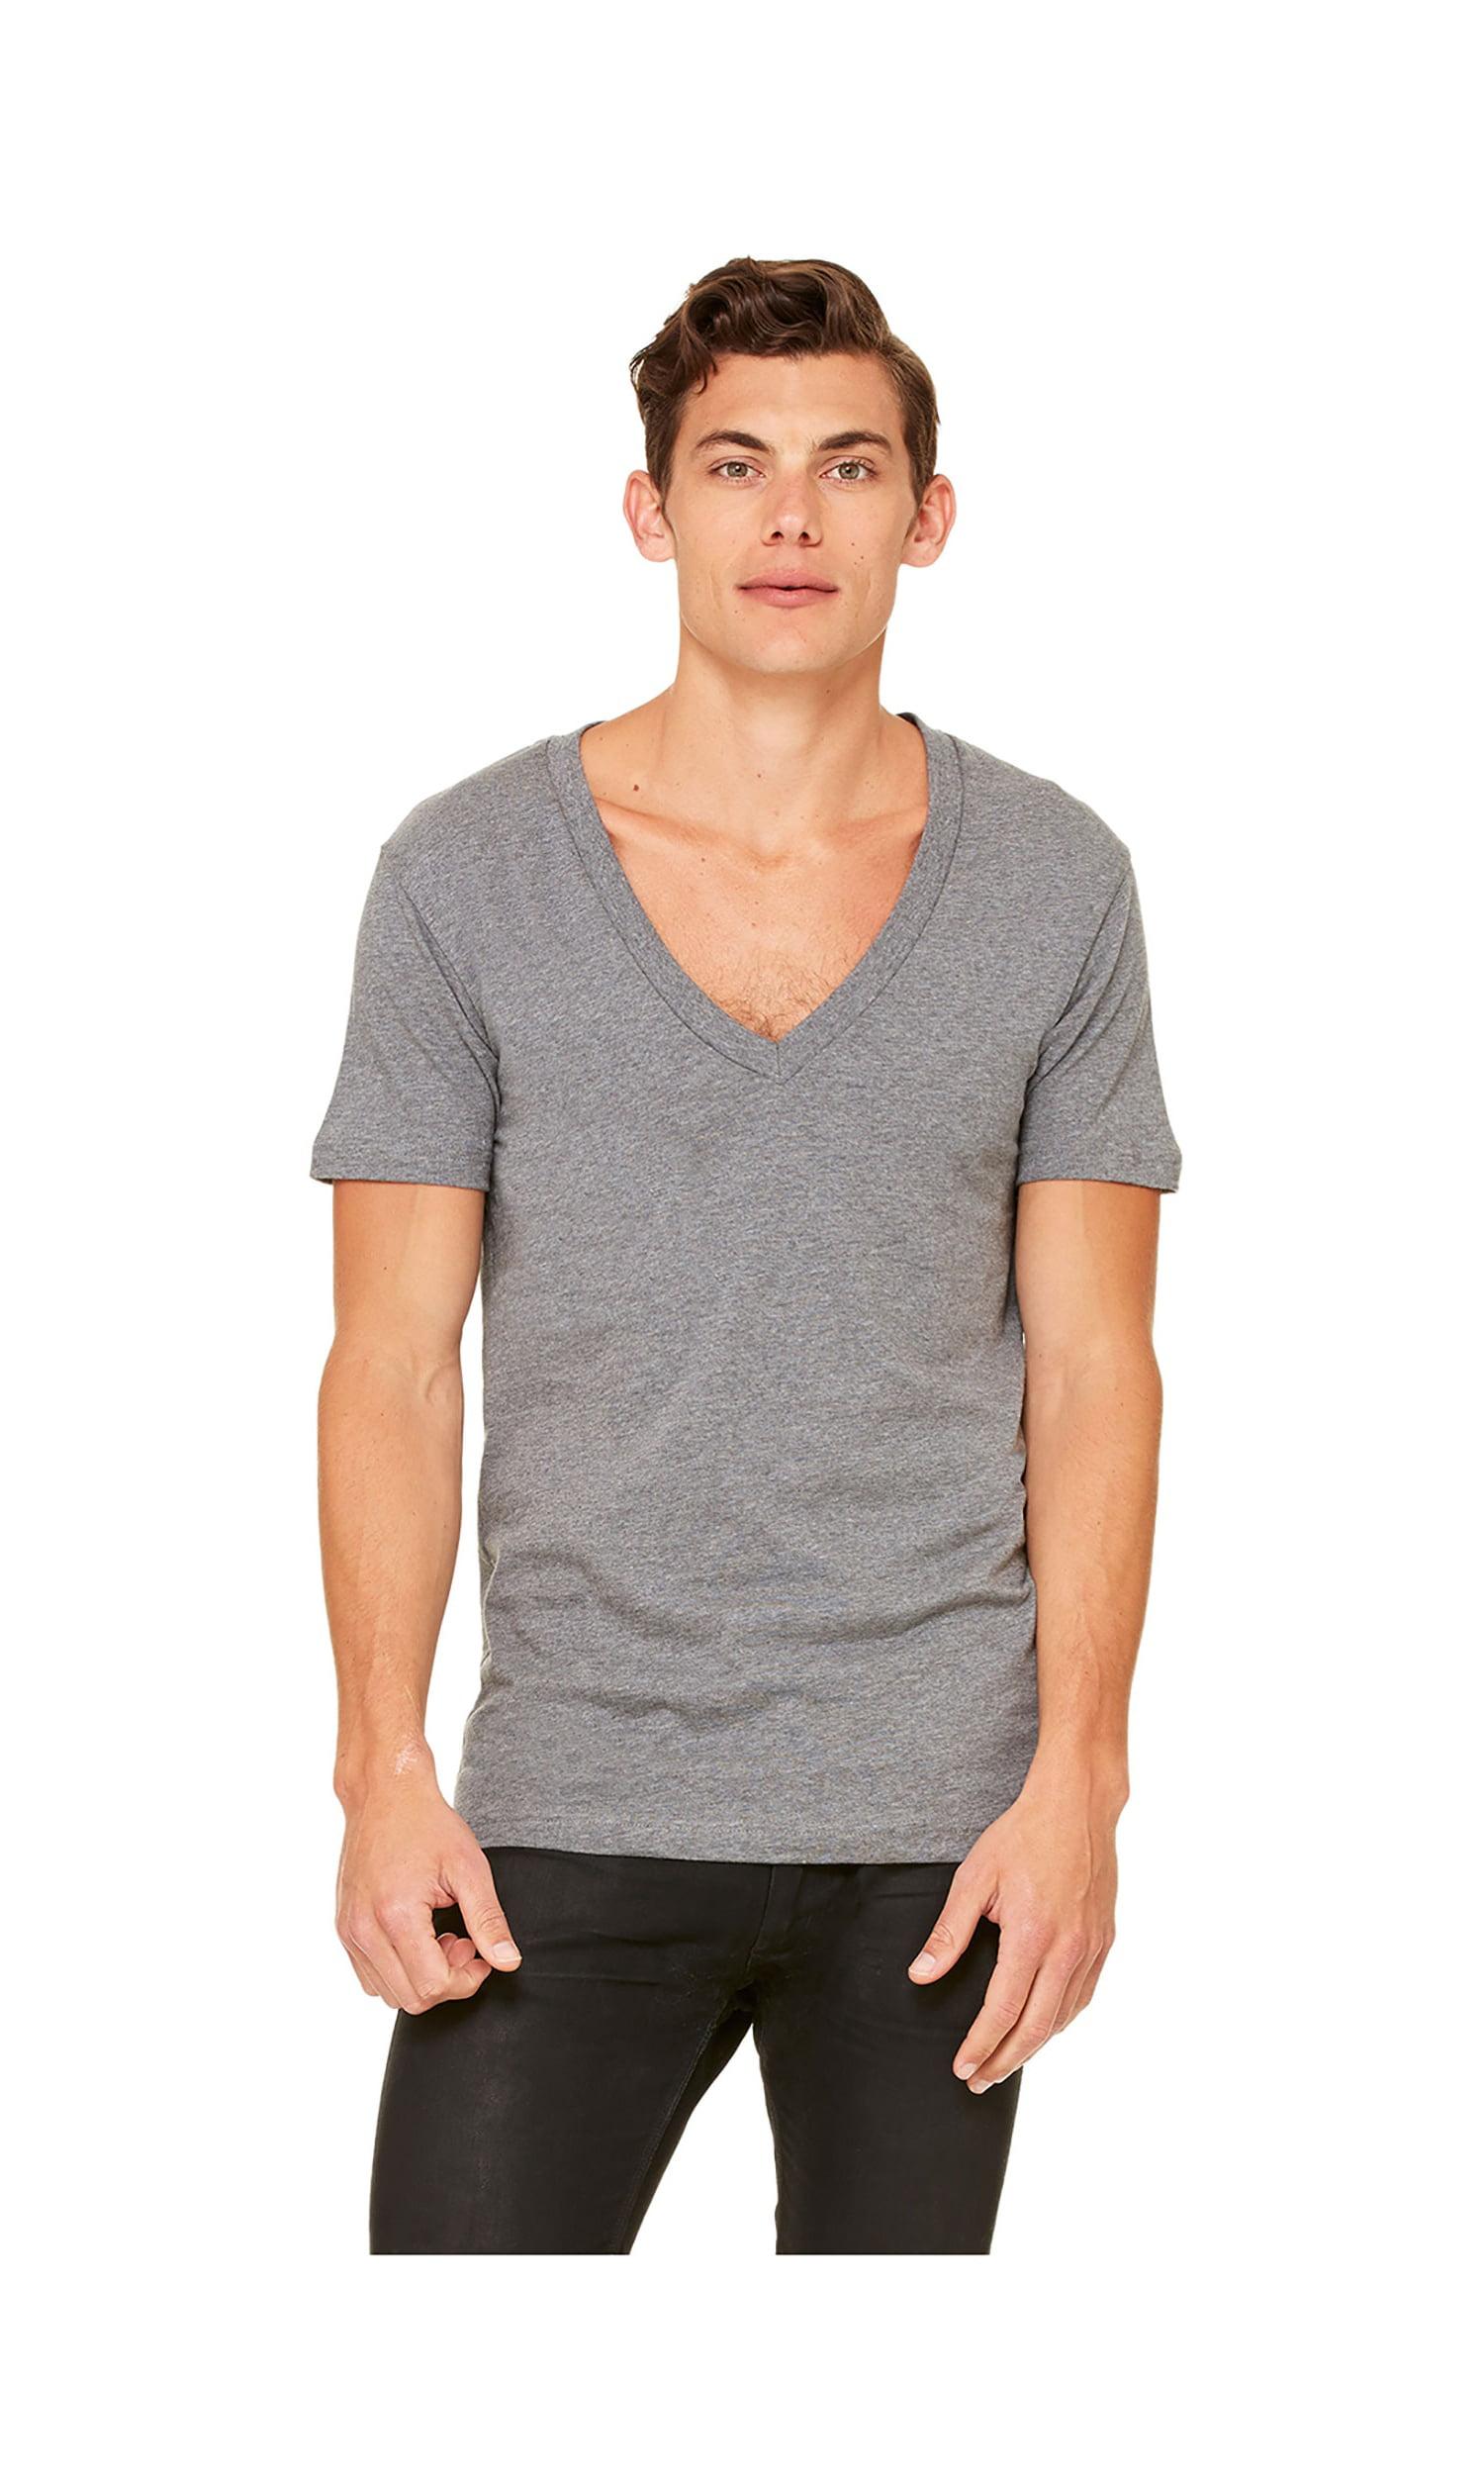 Canvas Unisex Jersey Deep V-Neck Short Sleeve T-Shirt